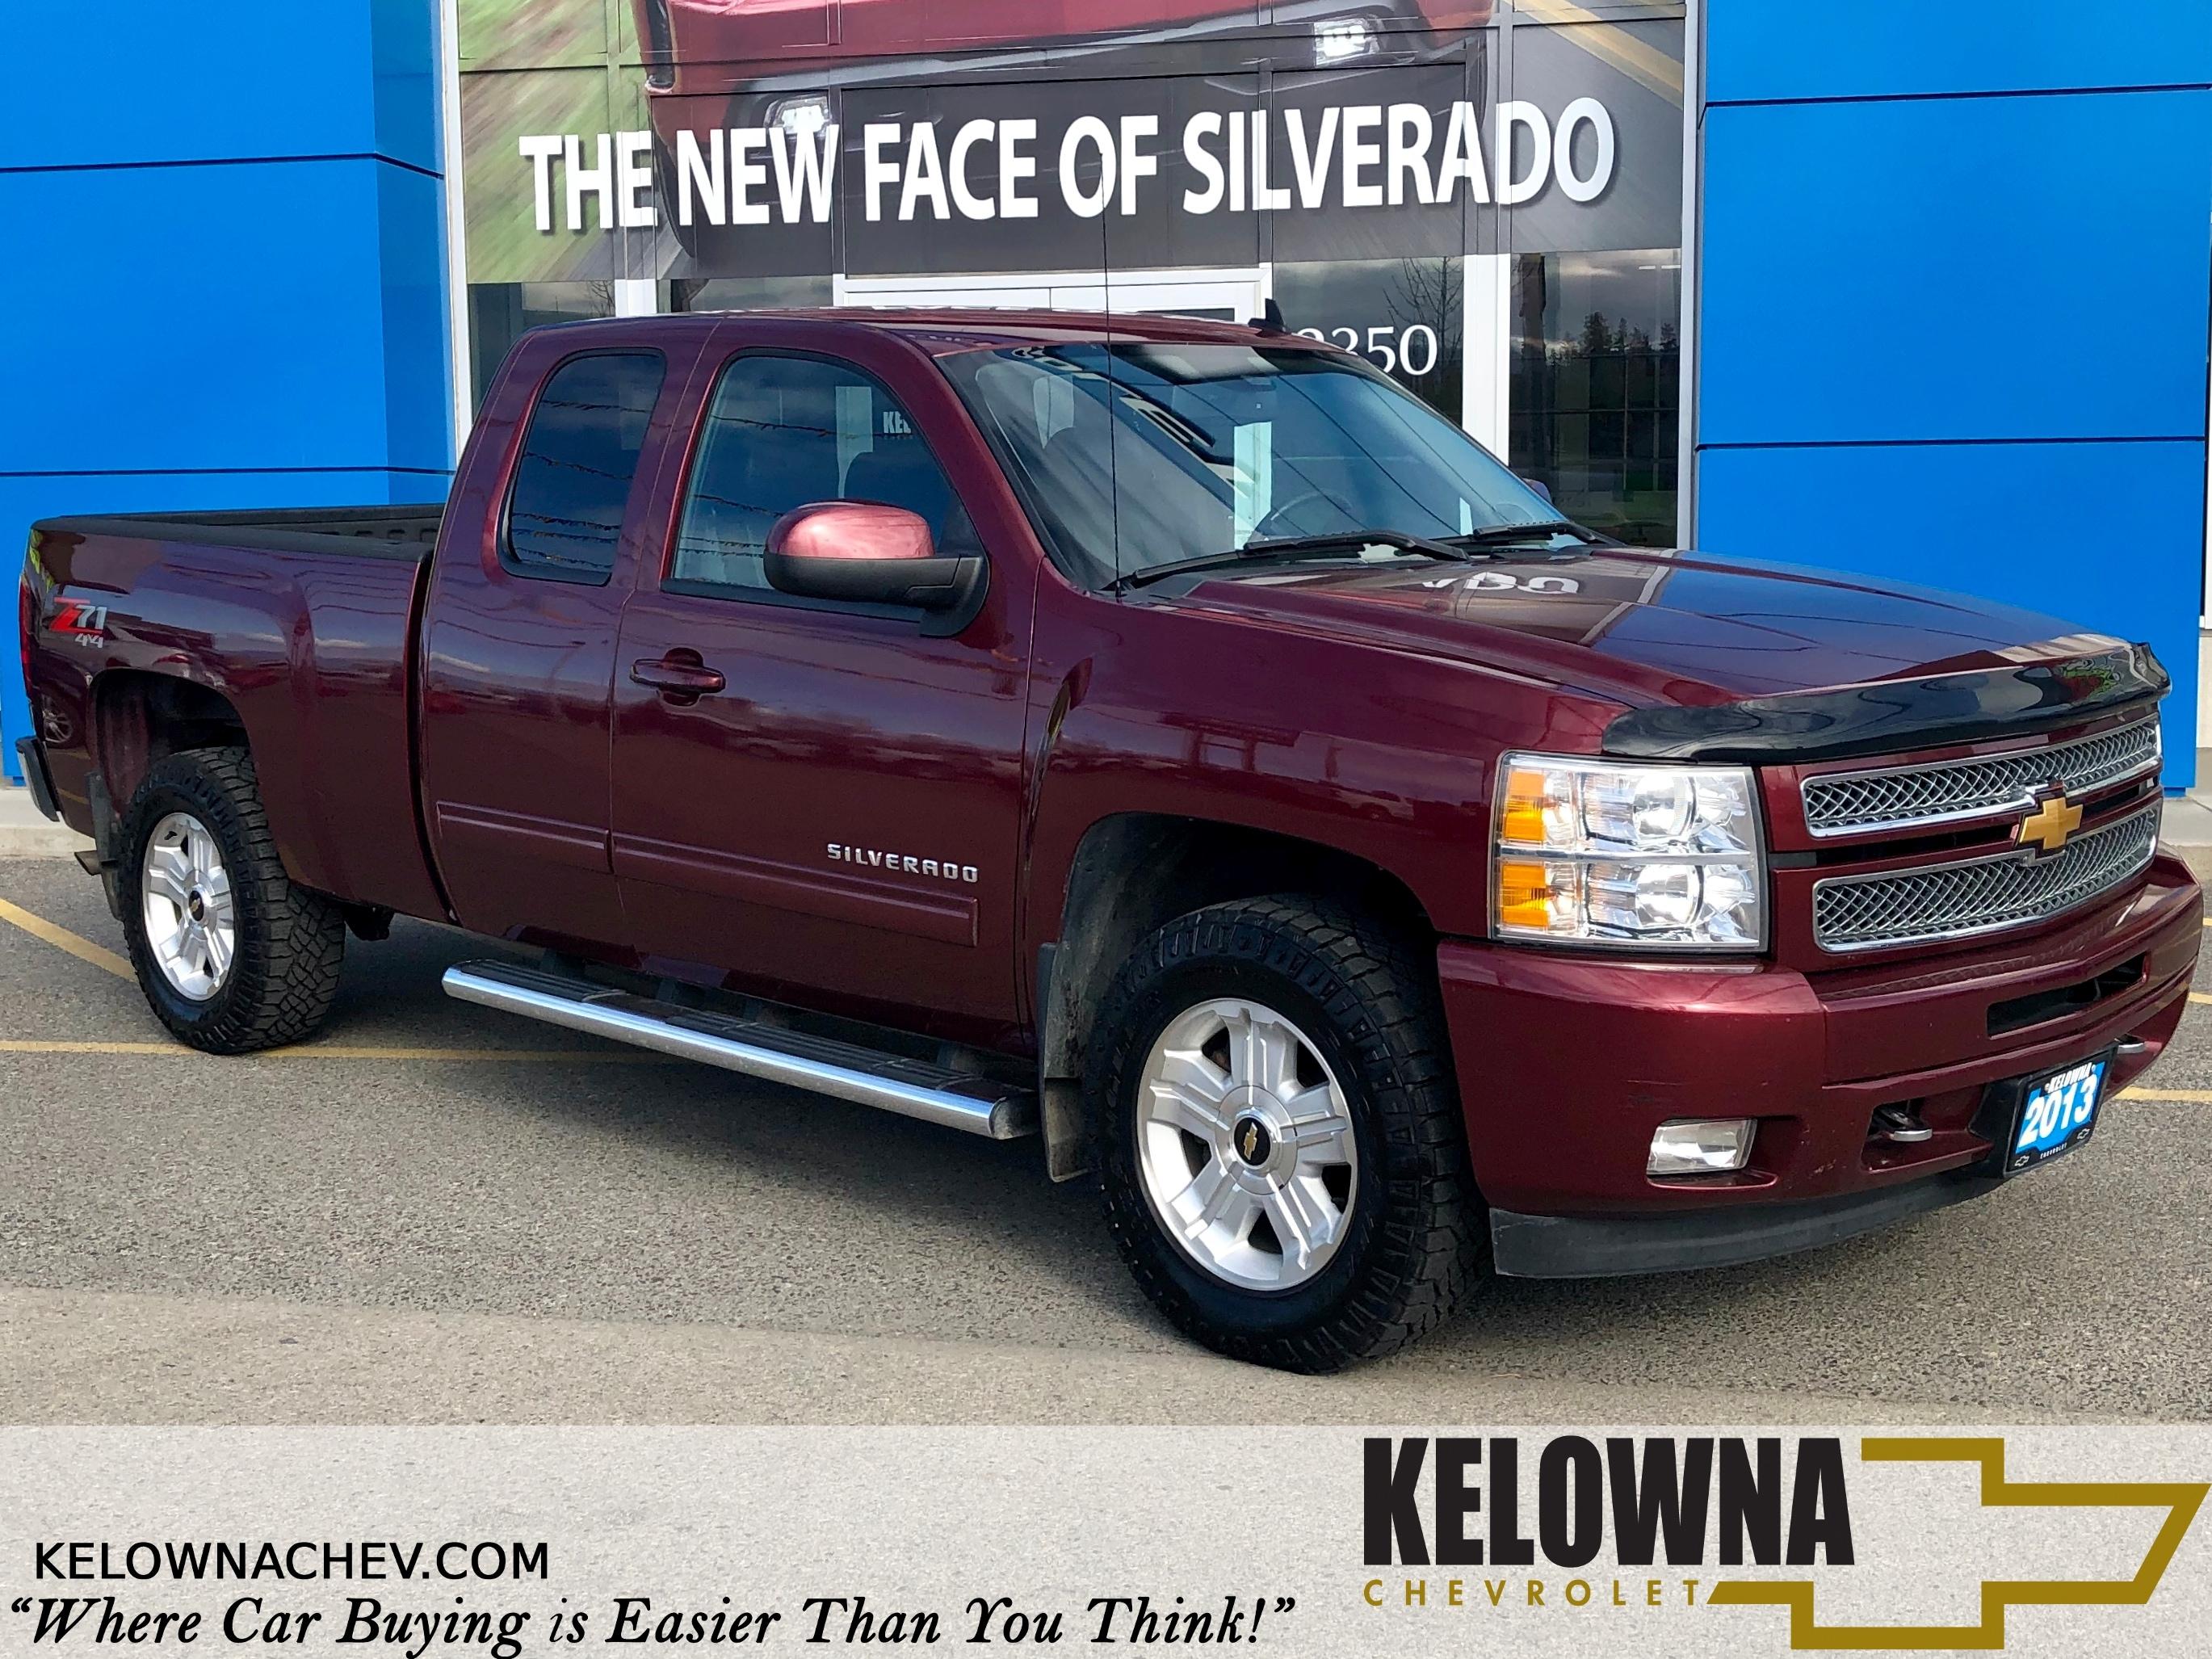 2013 Chevrolet Silverado 1500 LTZ Bluetooth, Back Up Camera 4x4 Truck Extended Cab